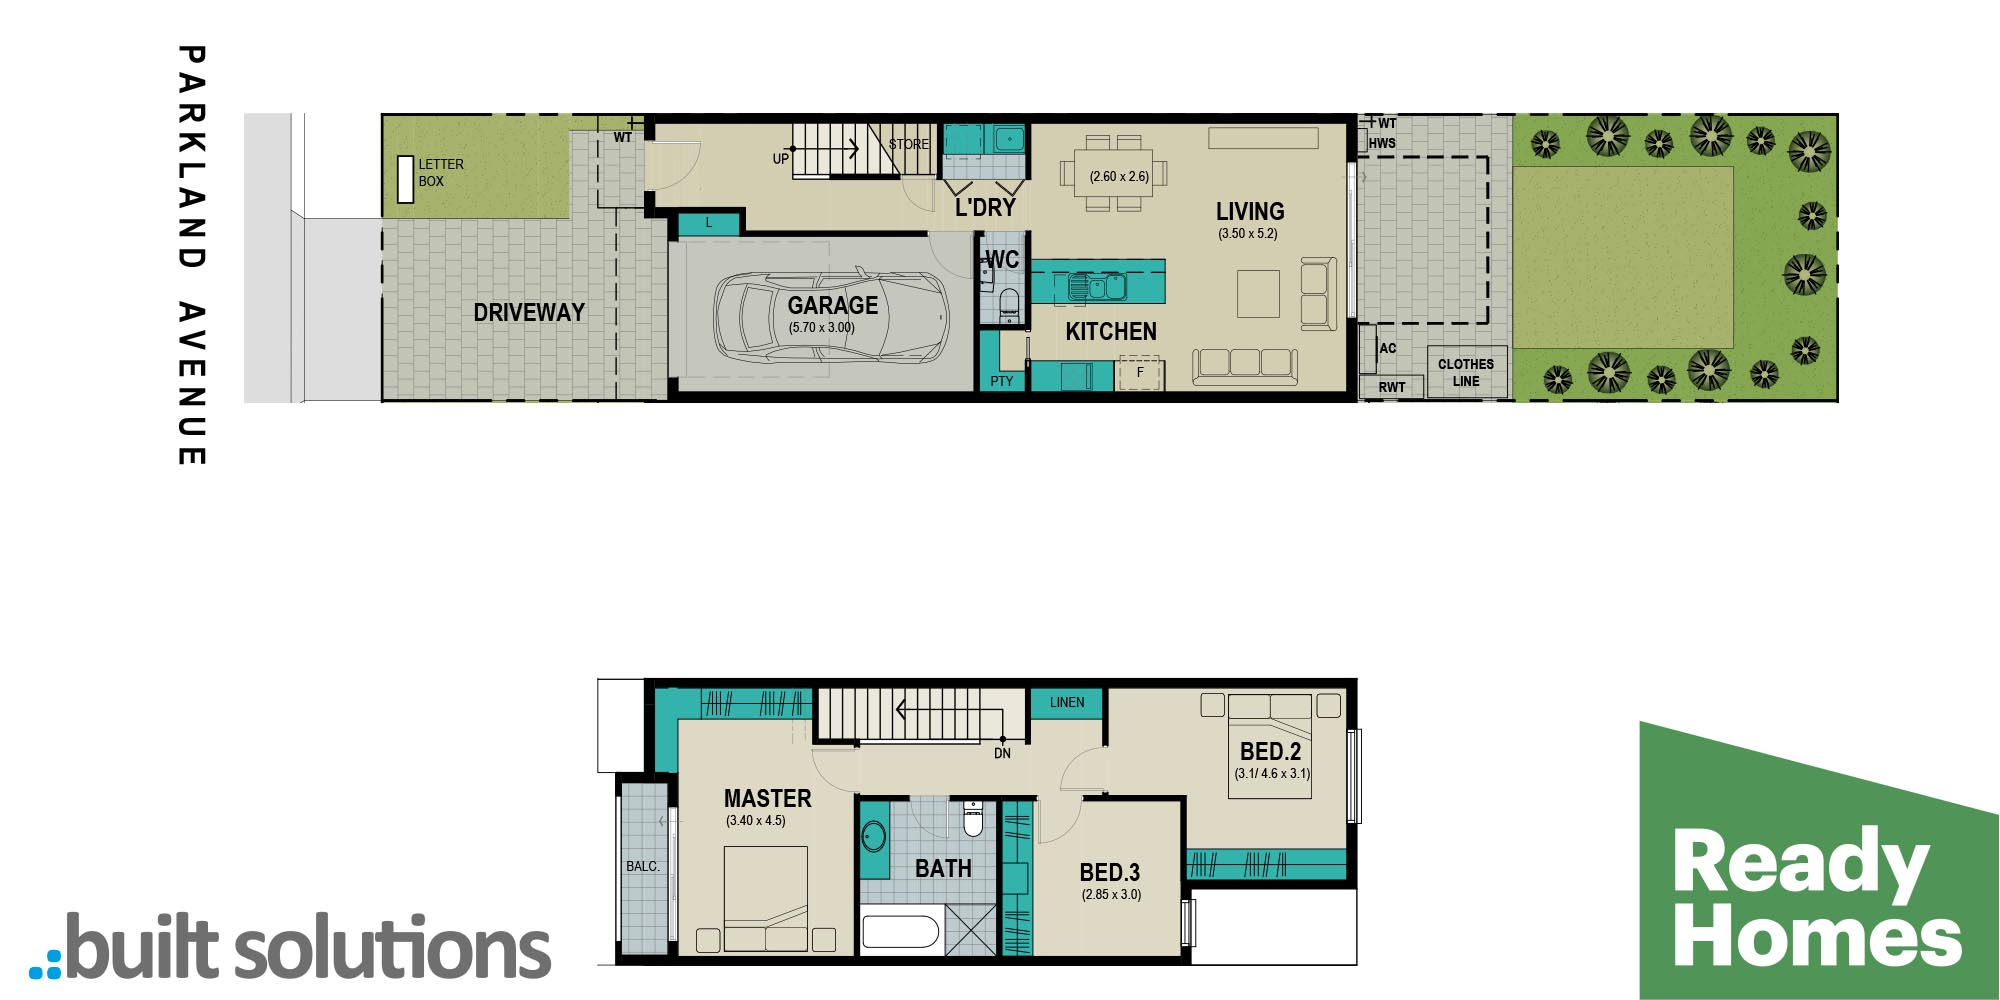 Lot 302 Parkland Avenue floorplan